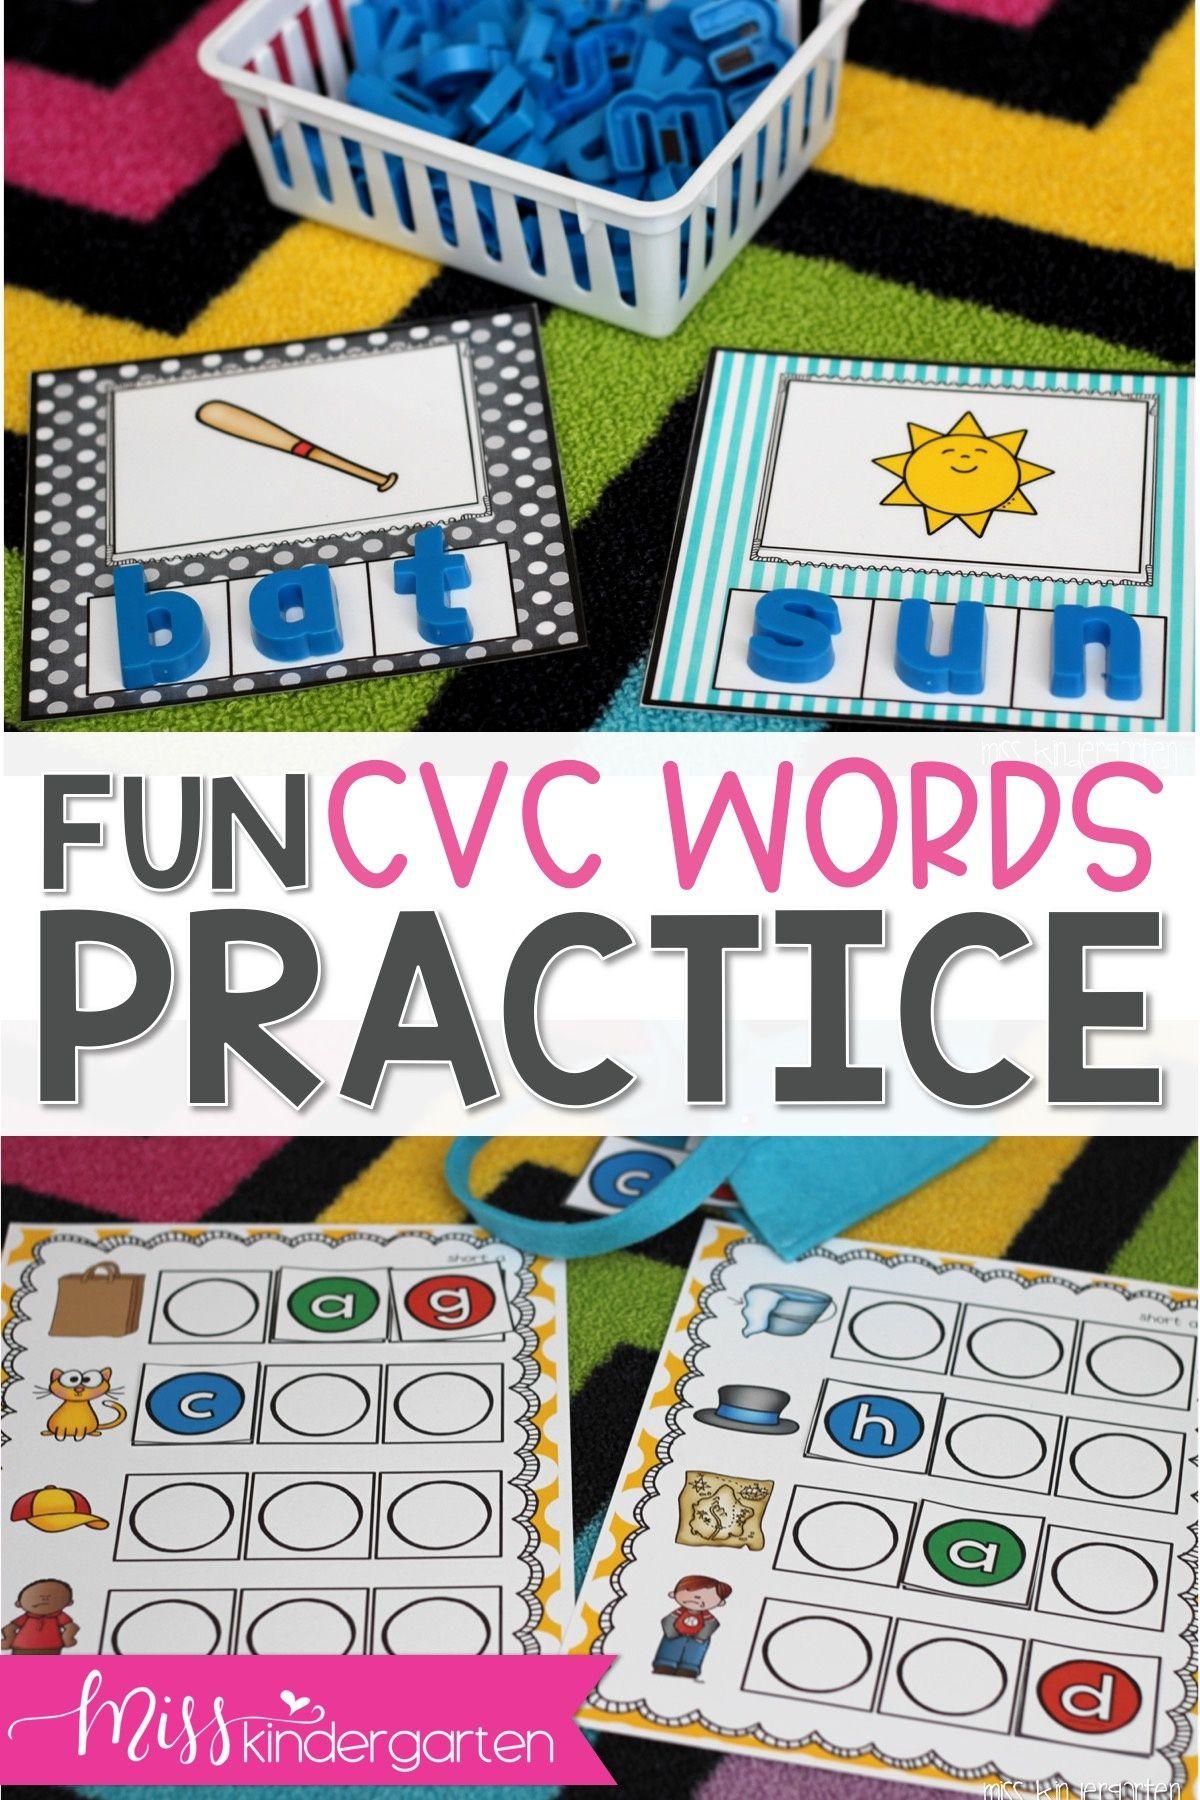 Fun And Engaging Cvc Activities For Your Kindergarten